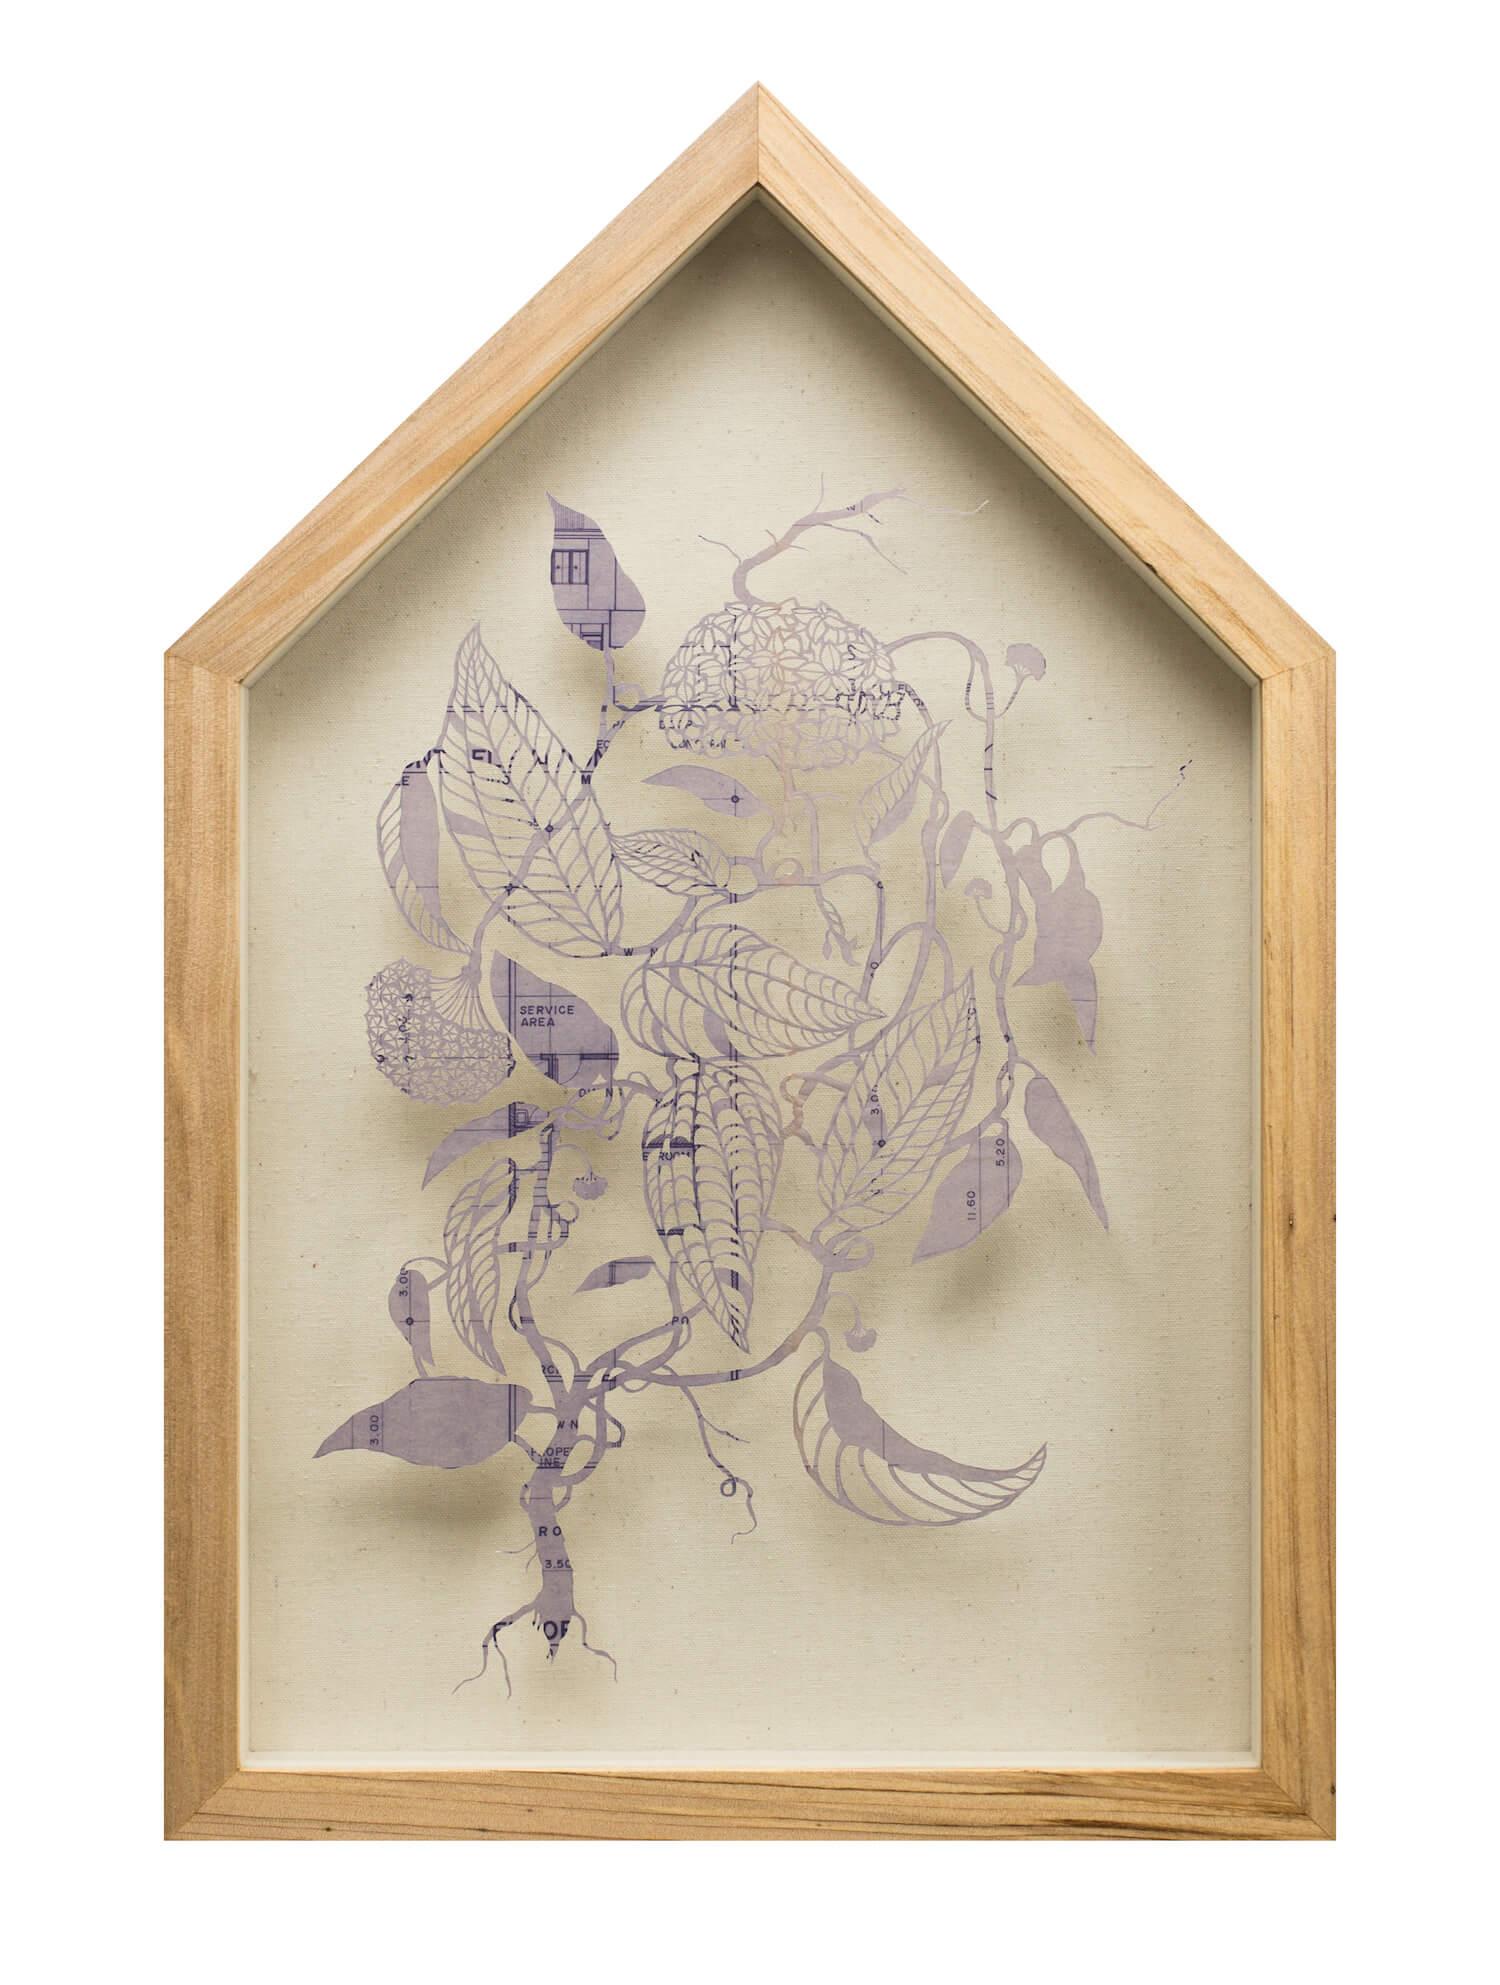 Ryan Villamael, 'Home: Hoya', 2019, blueprint, 61.5 x 40cm. Image courtesy of Silverlens and the artist.